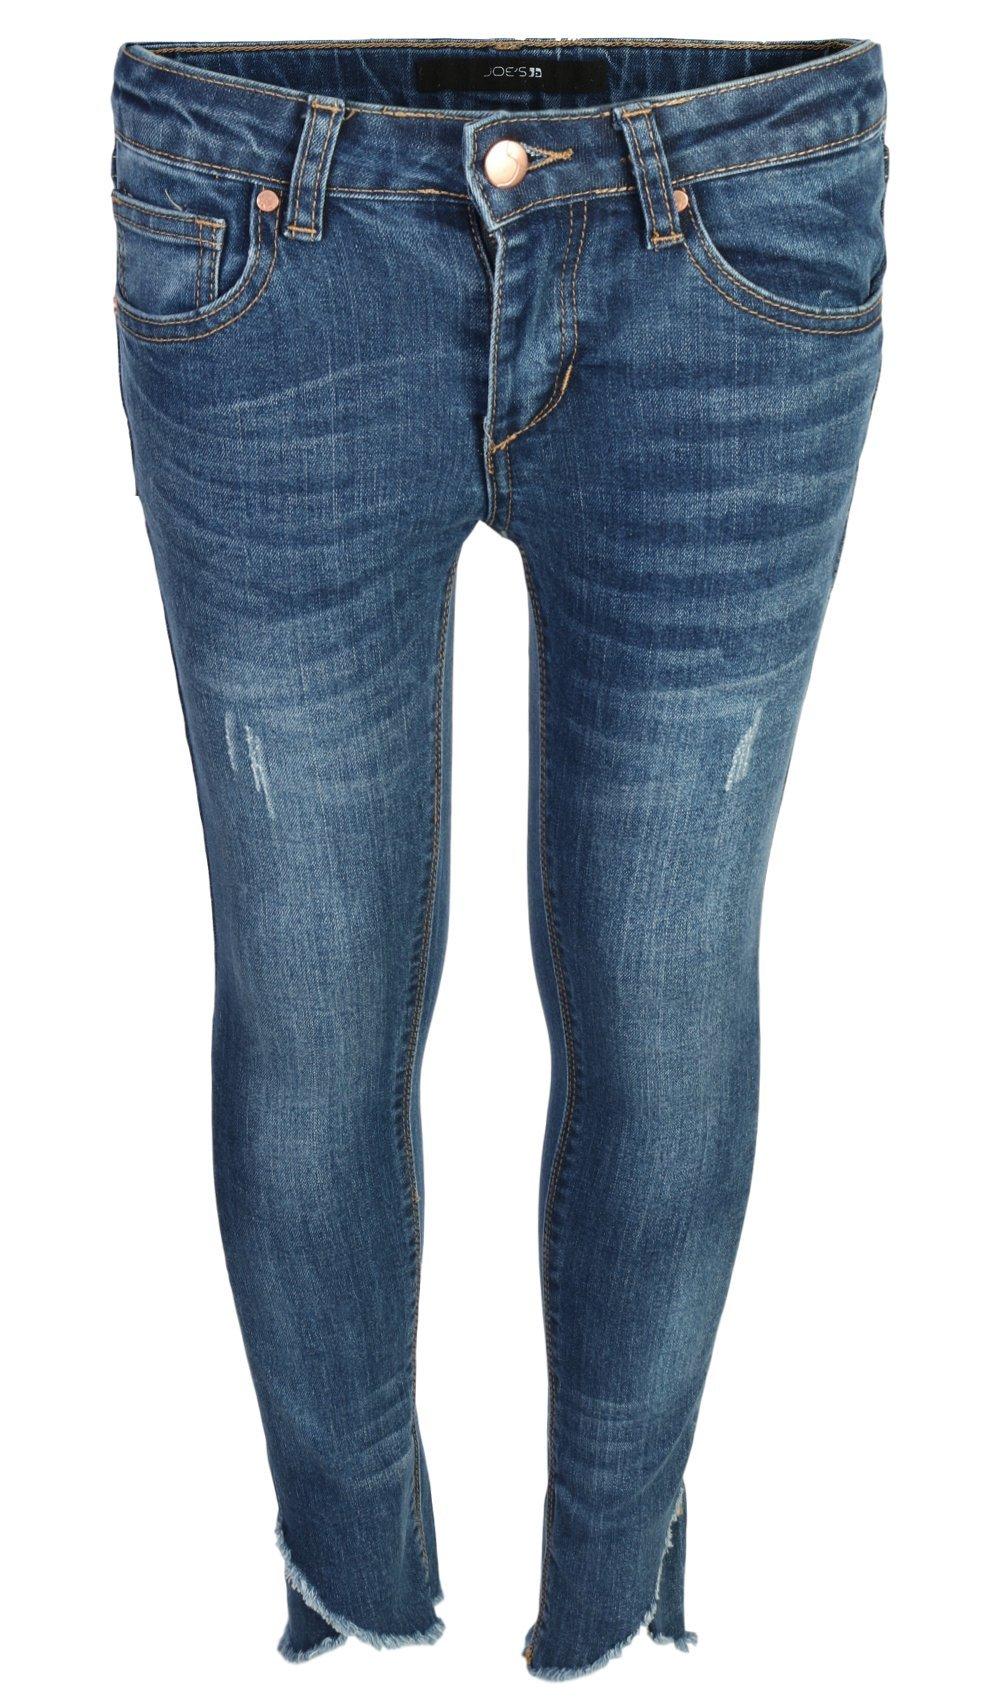 'Joe's Jeans Girls Ankle Skinny Stretch Jean, Wave, Size 12'